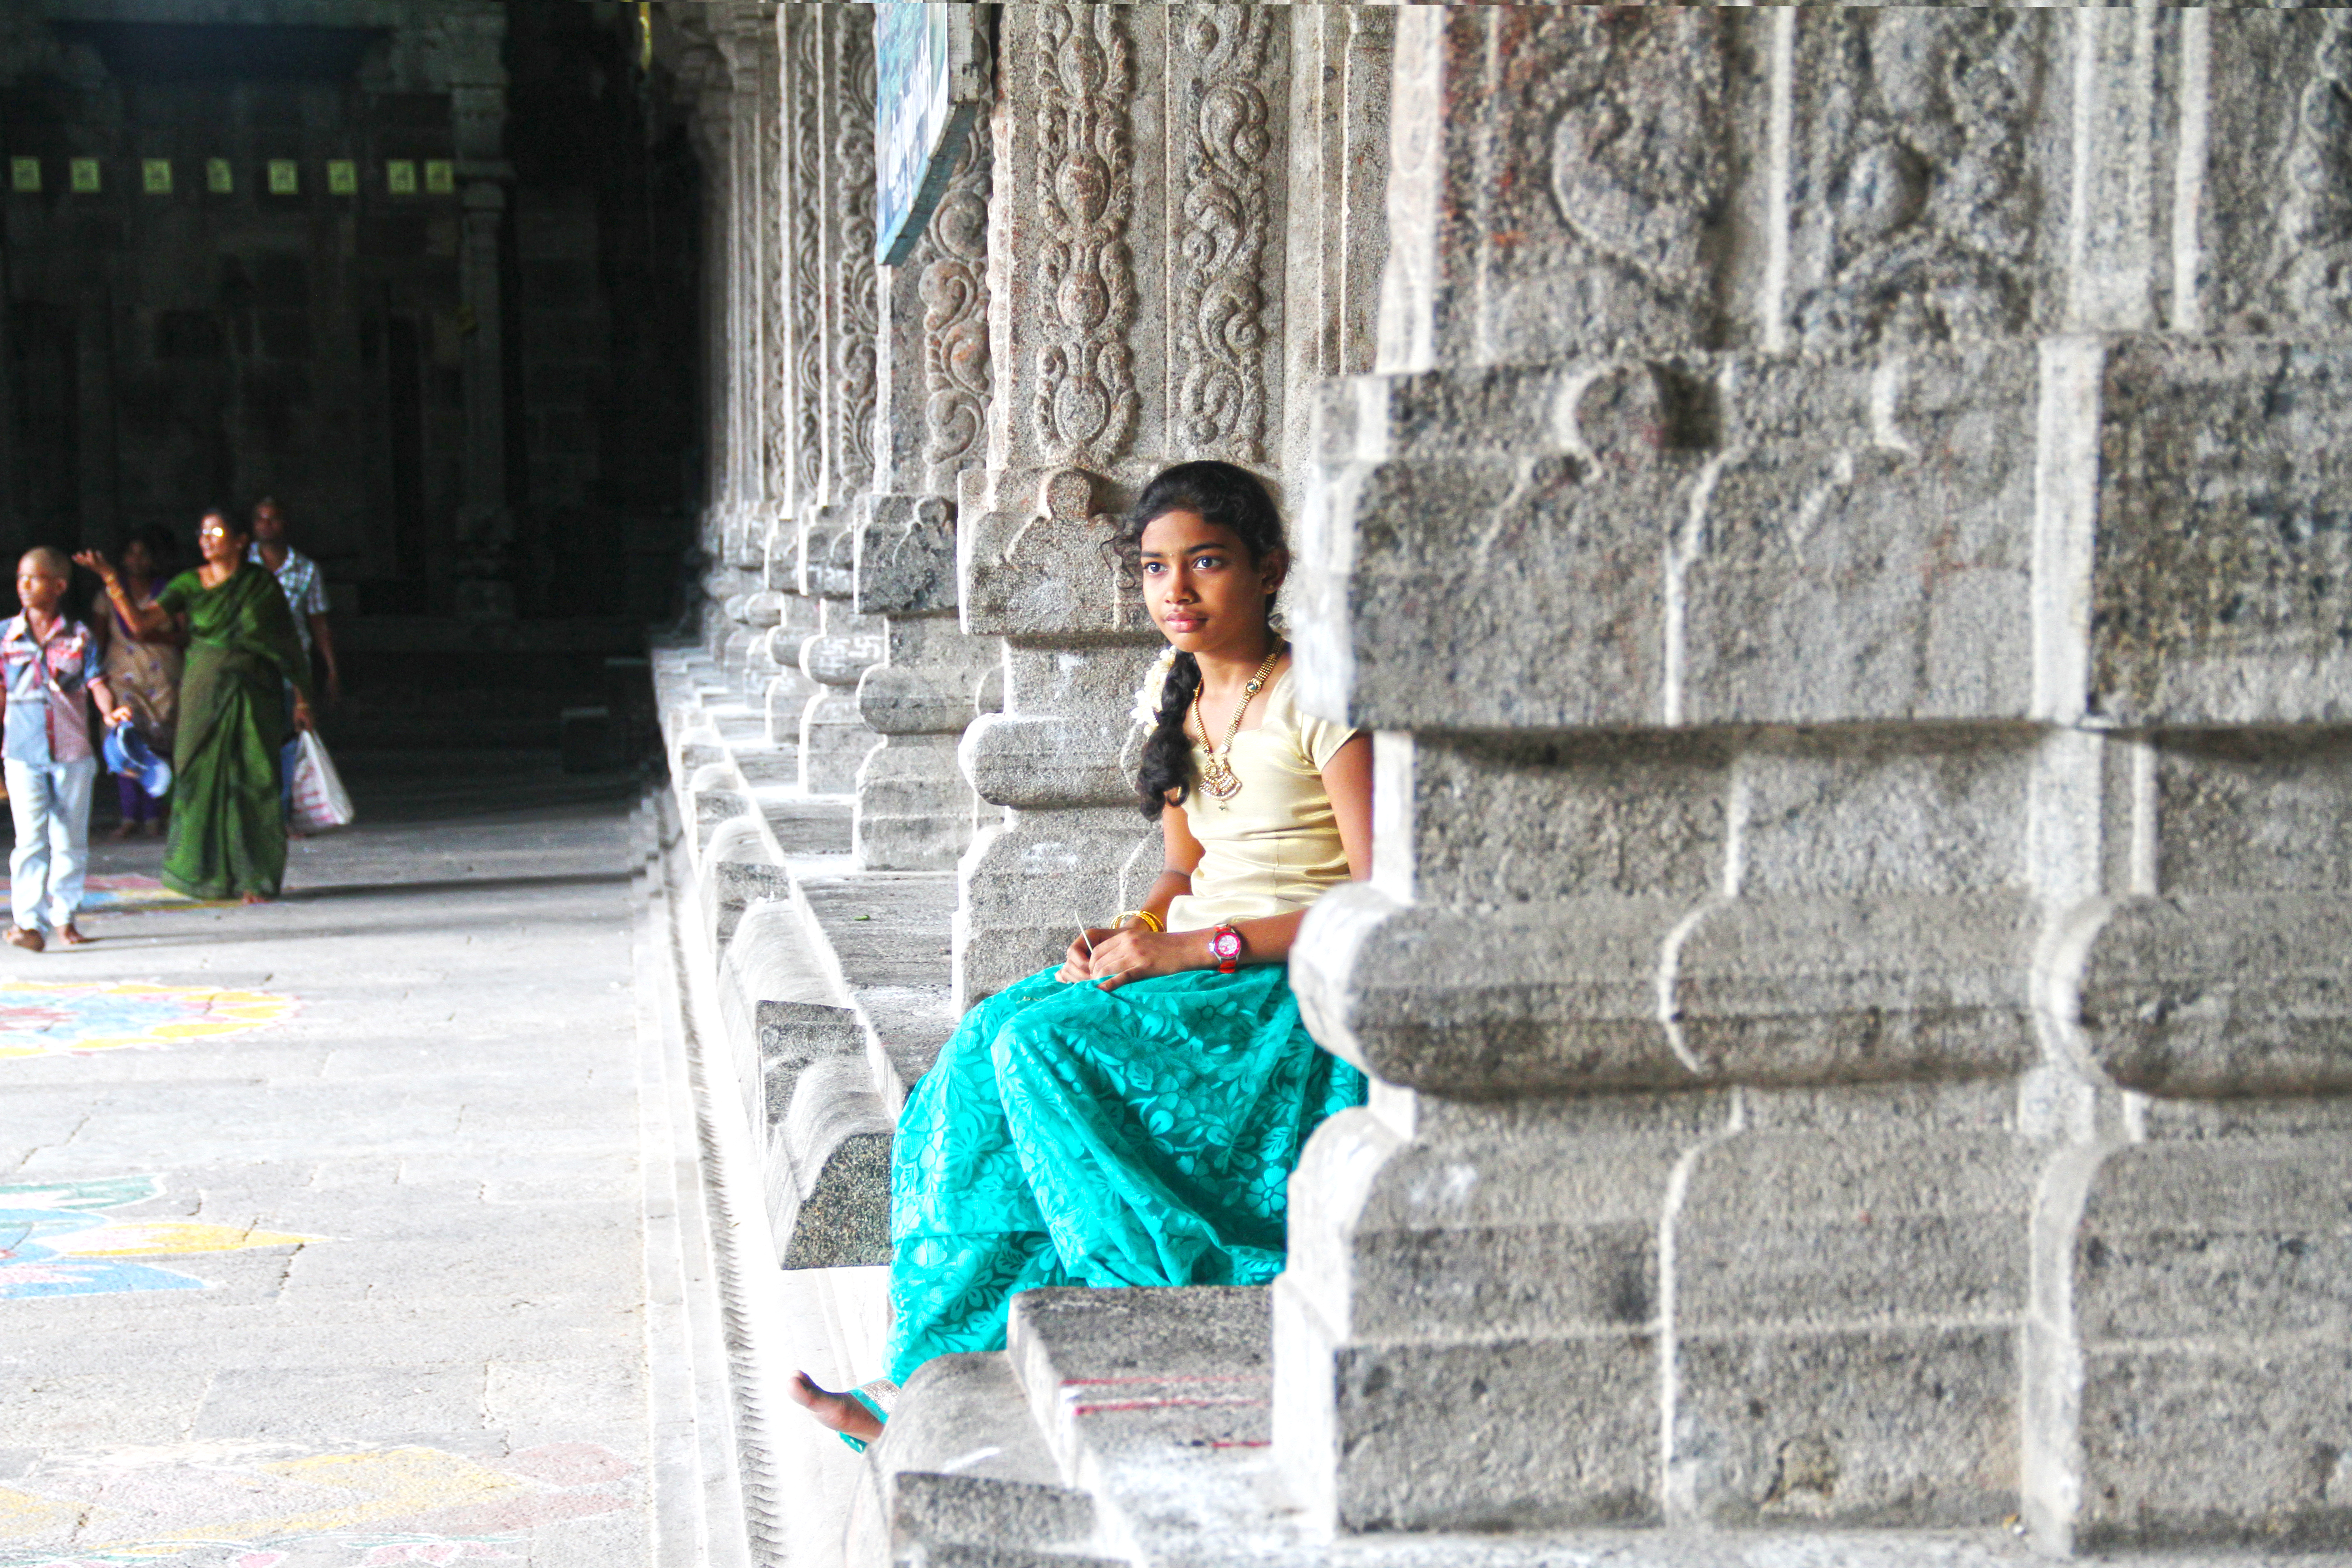 Girl Sitting Near Pillars